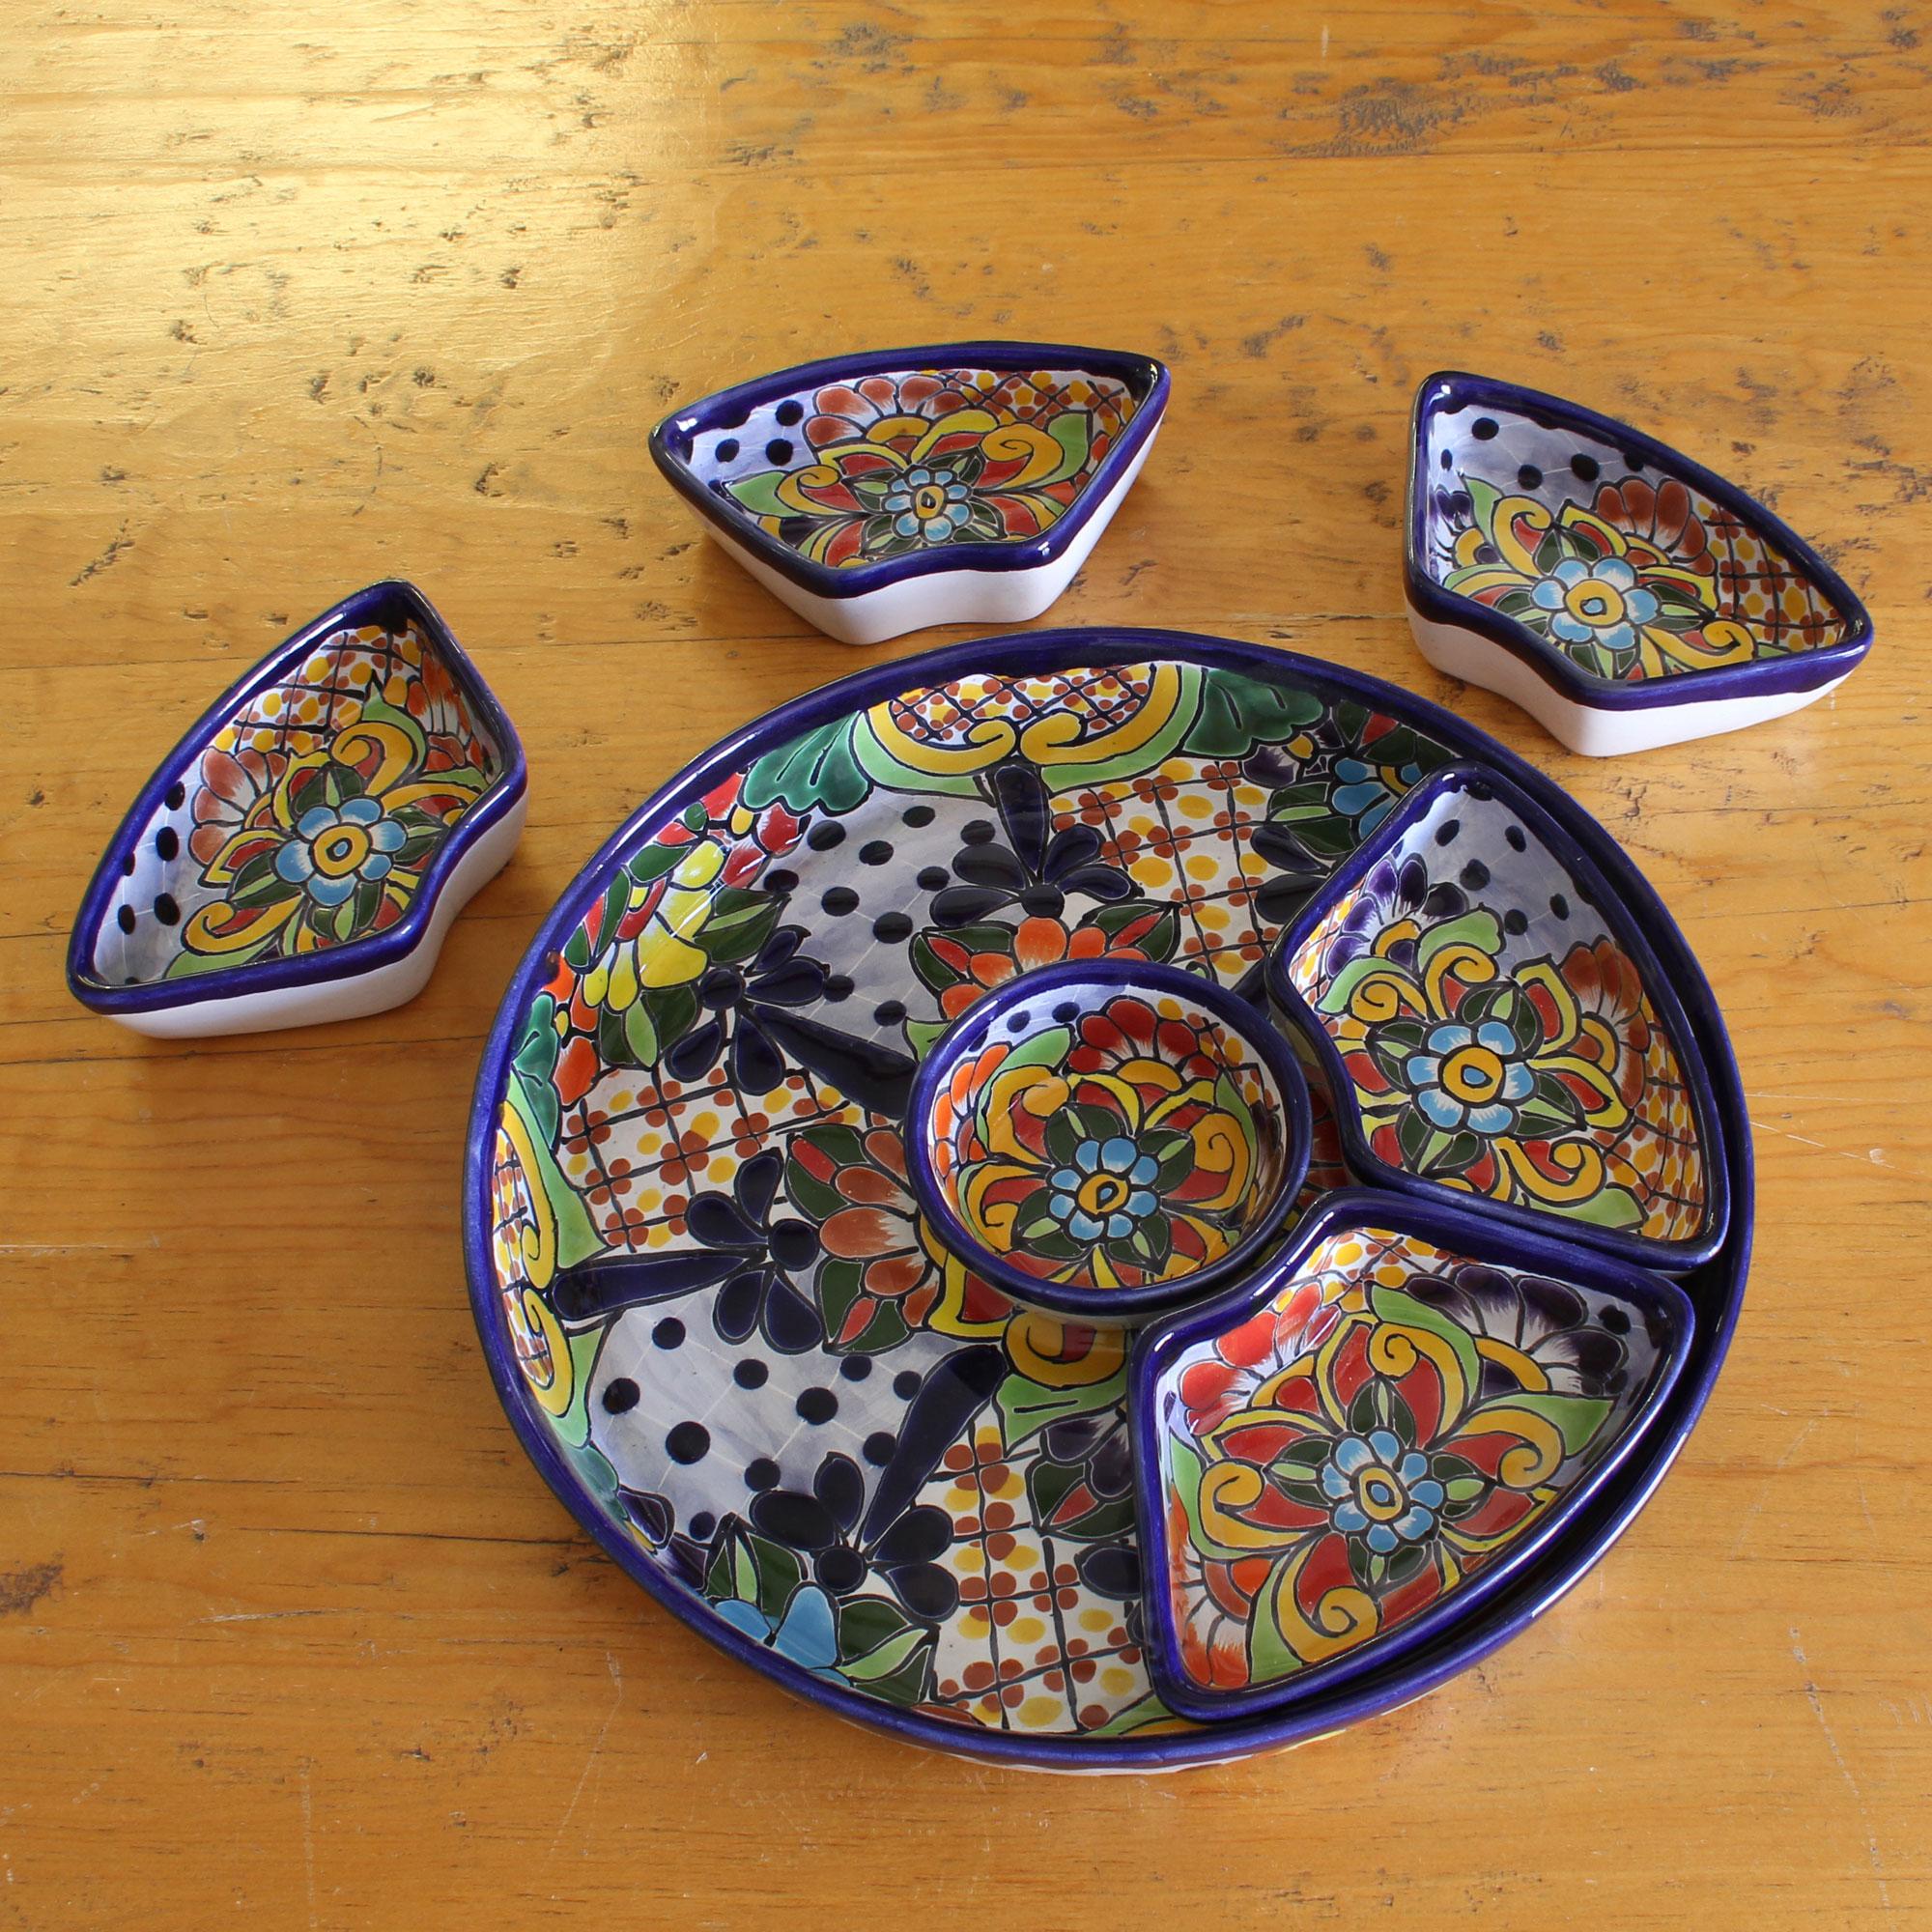 'Festive Feast' Fair Trade Mexican Talavera Ceramic Canape Platter Hostess Gift